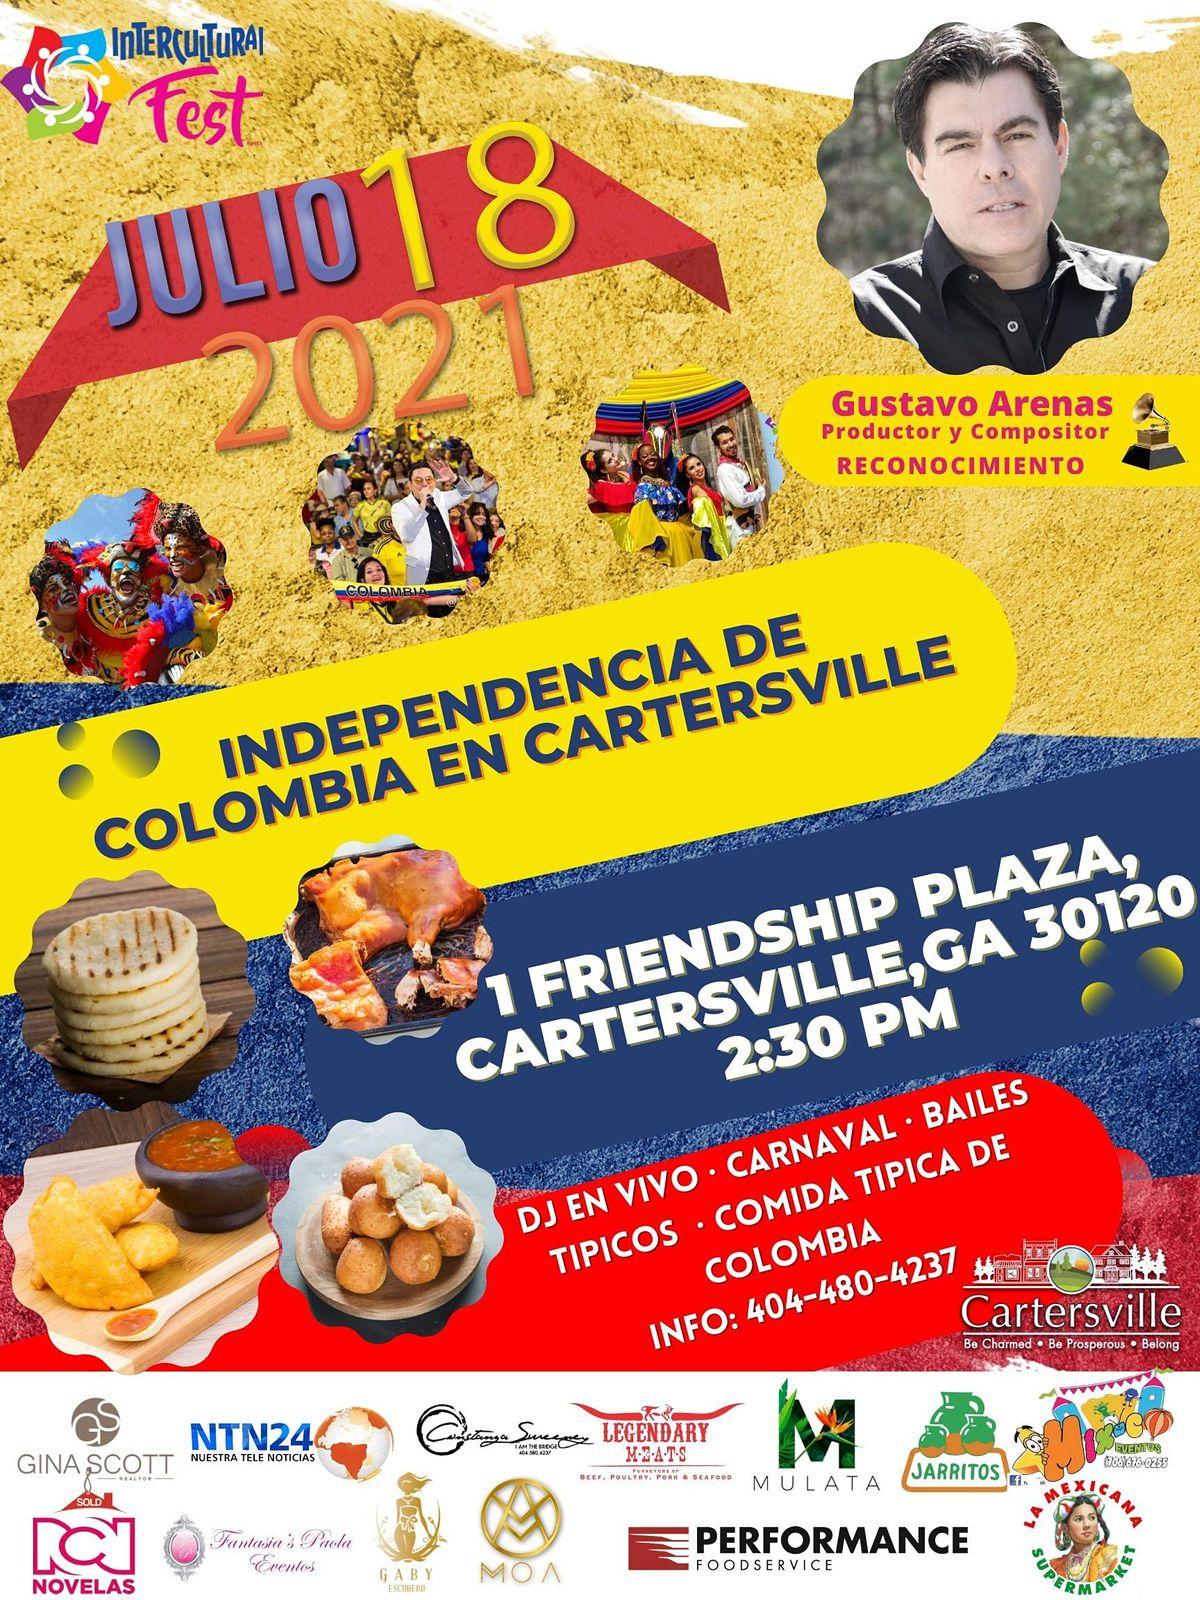 Independencia De Colombia en Cartersville  Gratis! Entrada Free! | Event in Cartersville | AllEvents.in